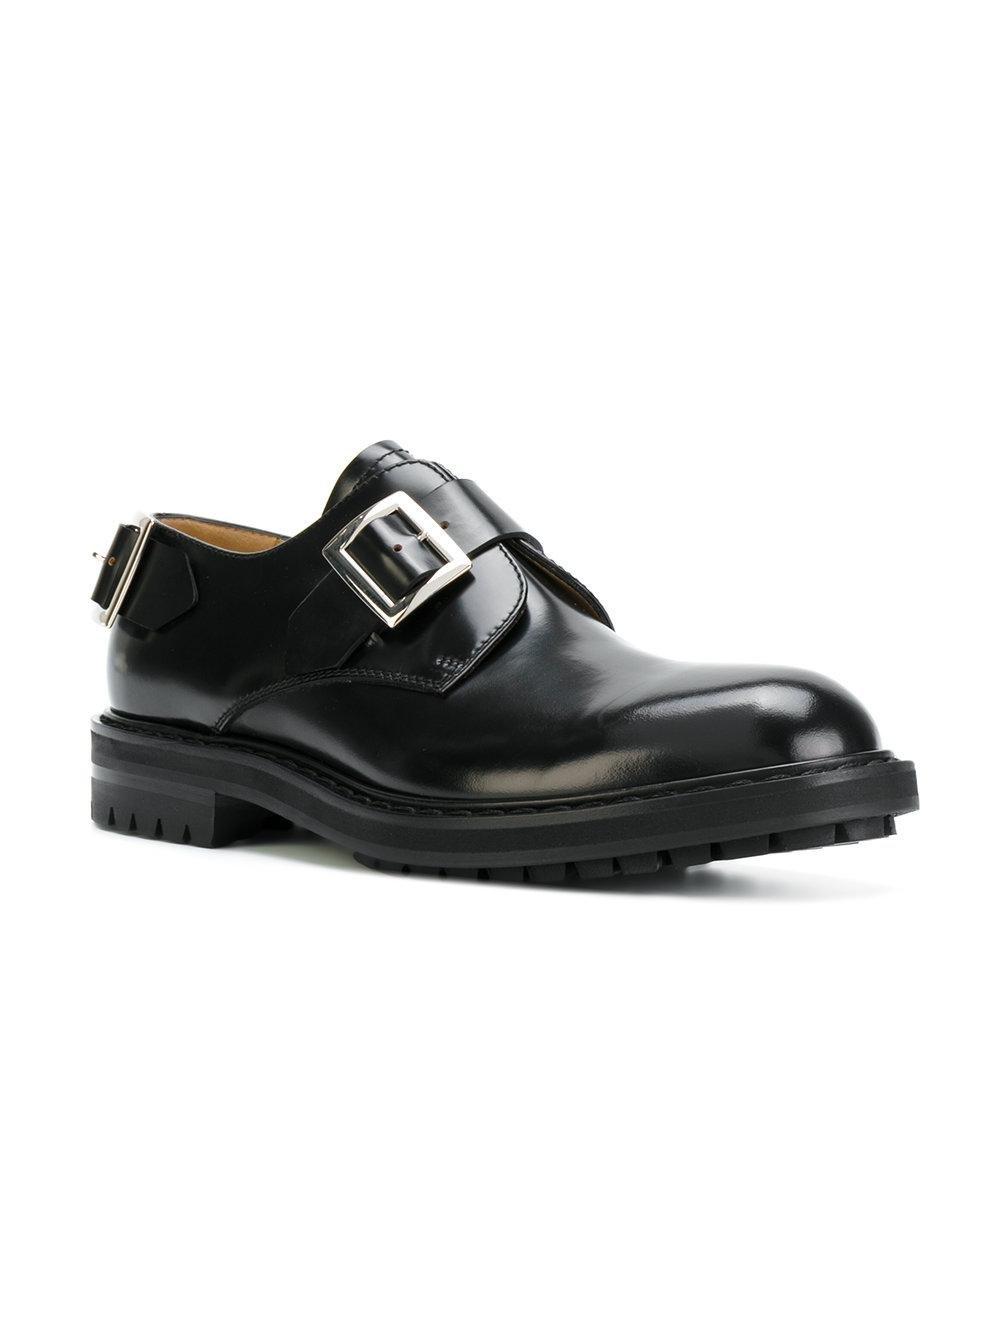 Alexander McQueen Leather Buckle Detail Slip On Shoes in Black for Men